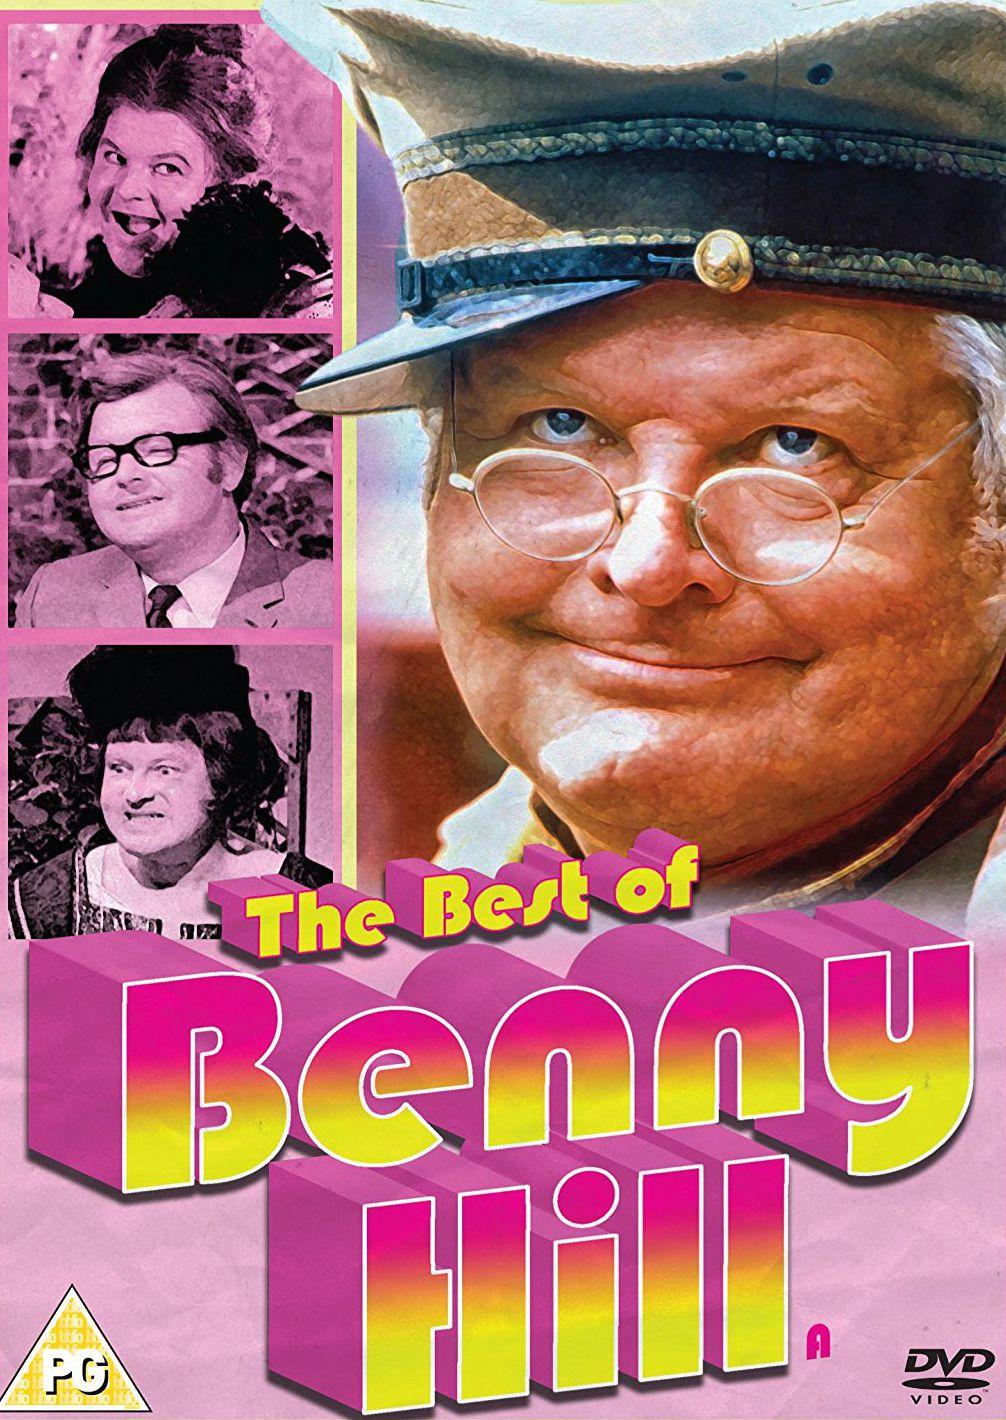 Benny Hill - 2C (1962)